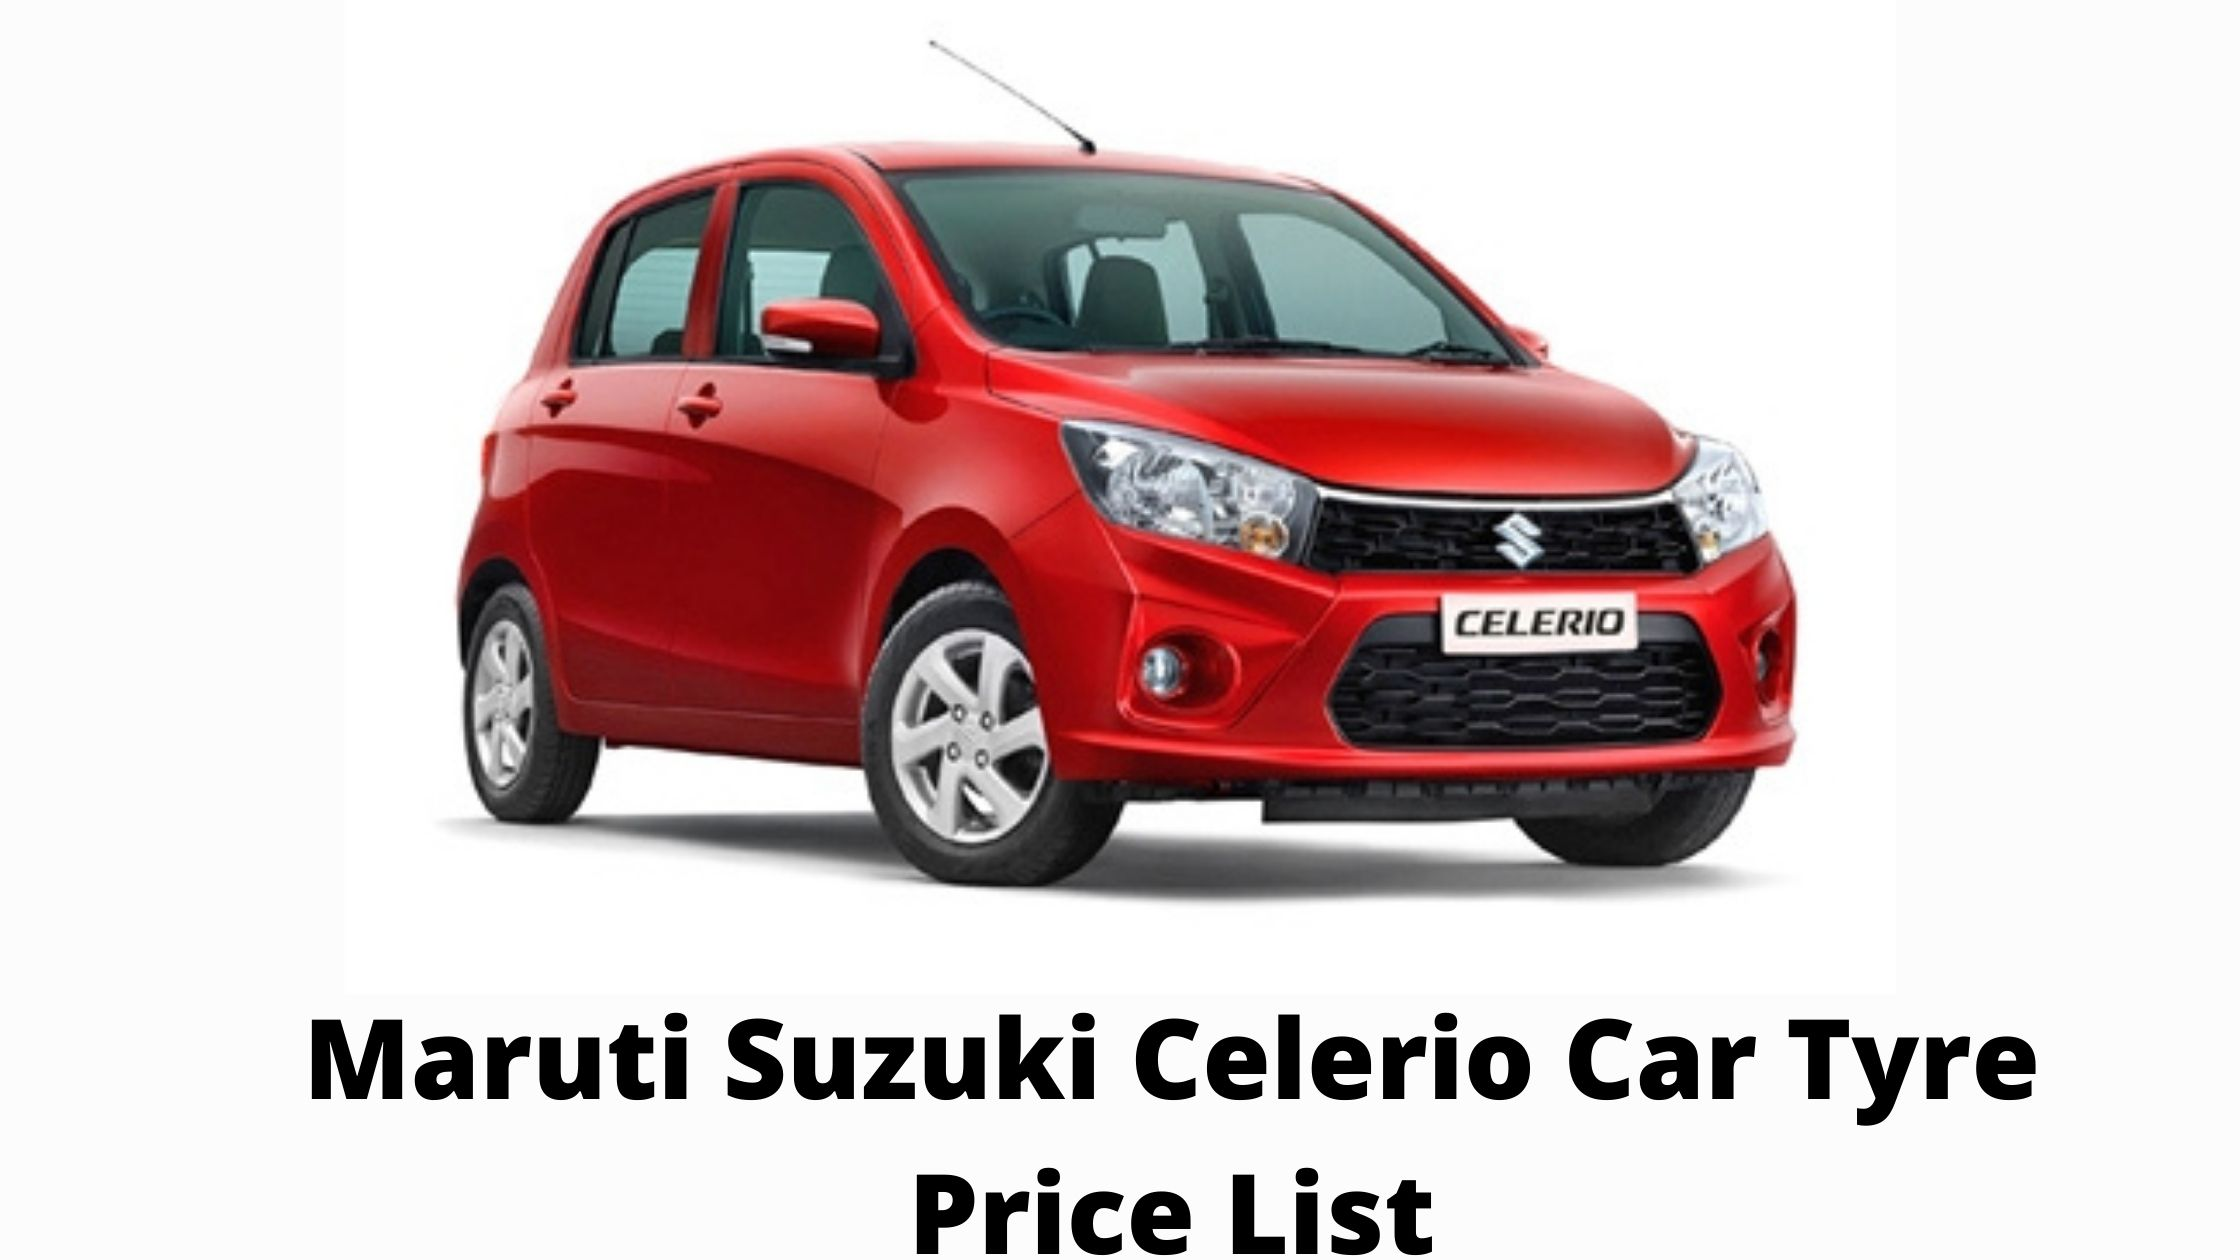 Maruti Suzuki Celerio Car Tyre Price List in India